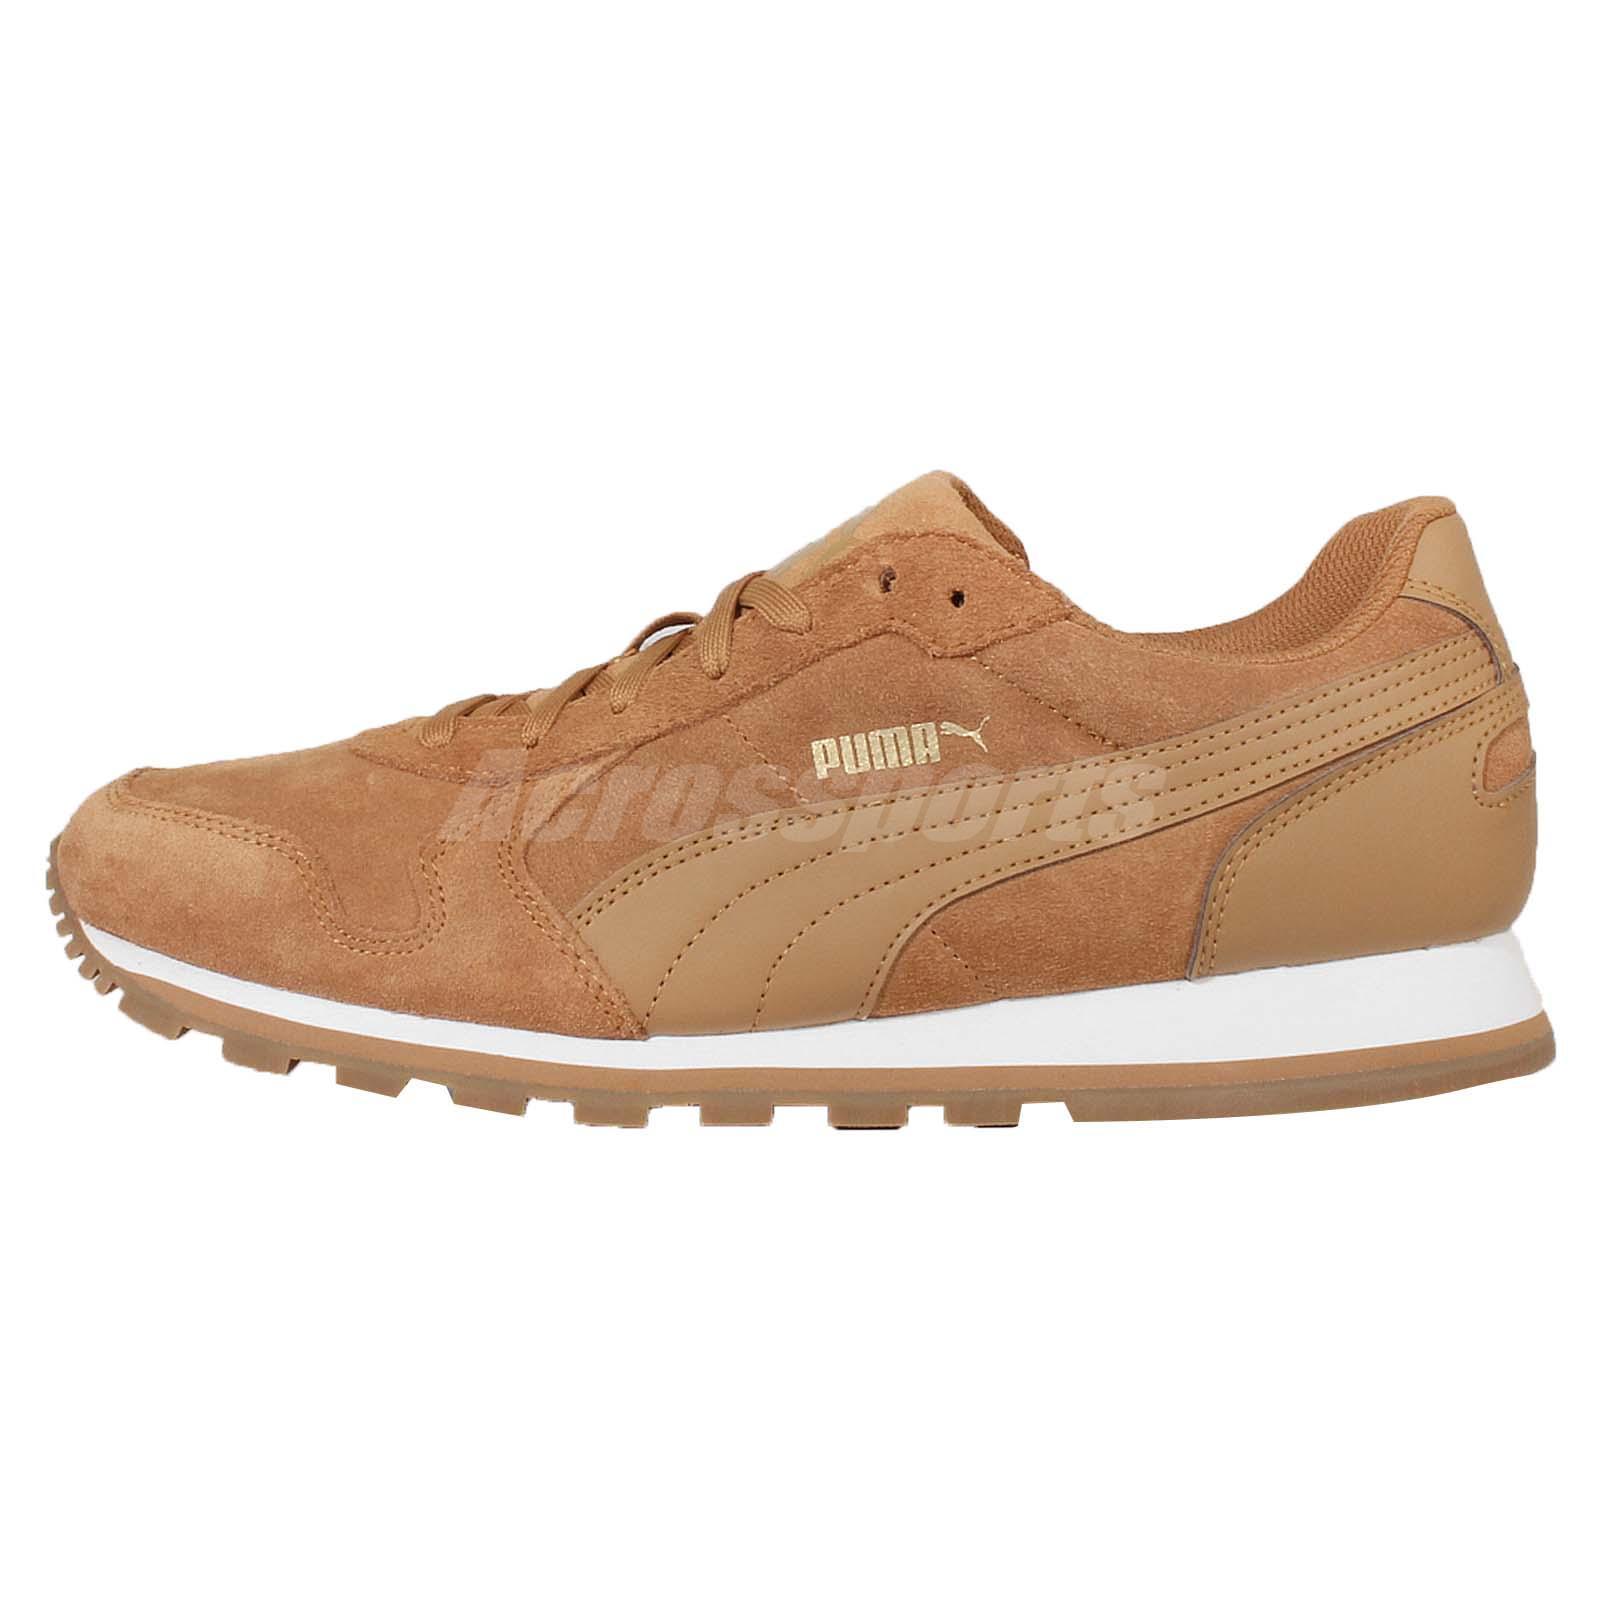 Puma Brown Sneakers